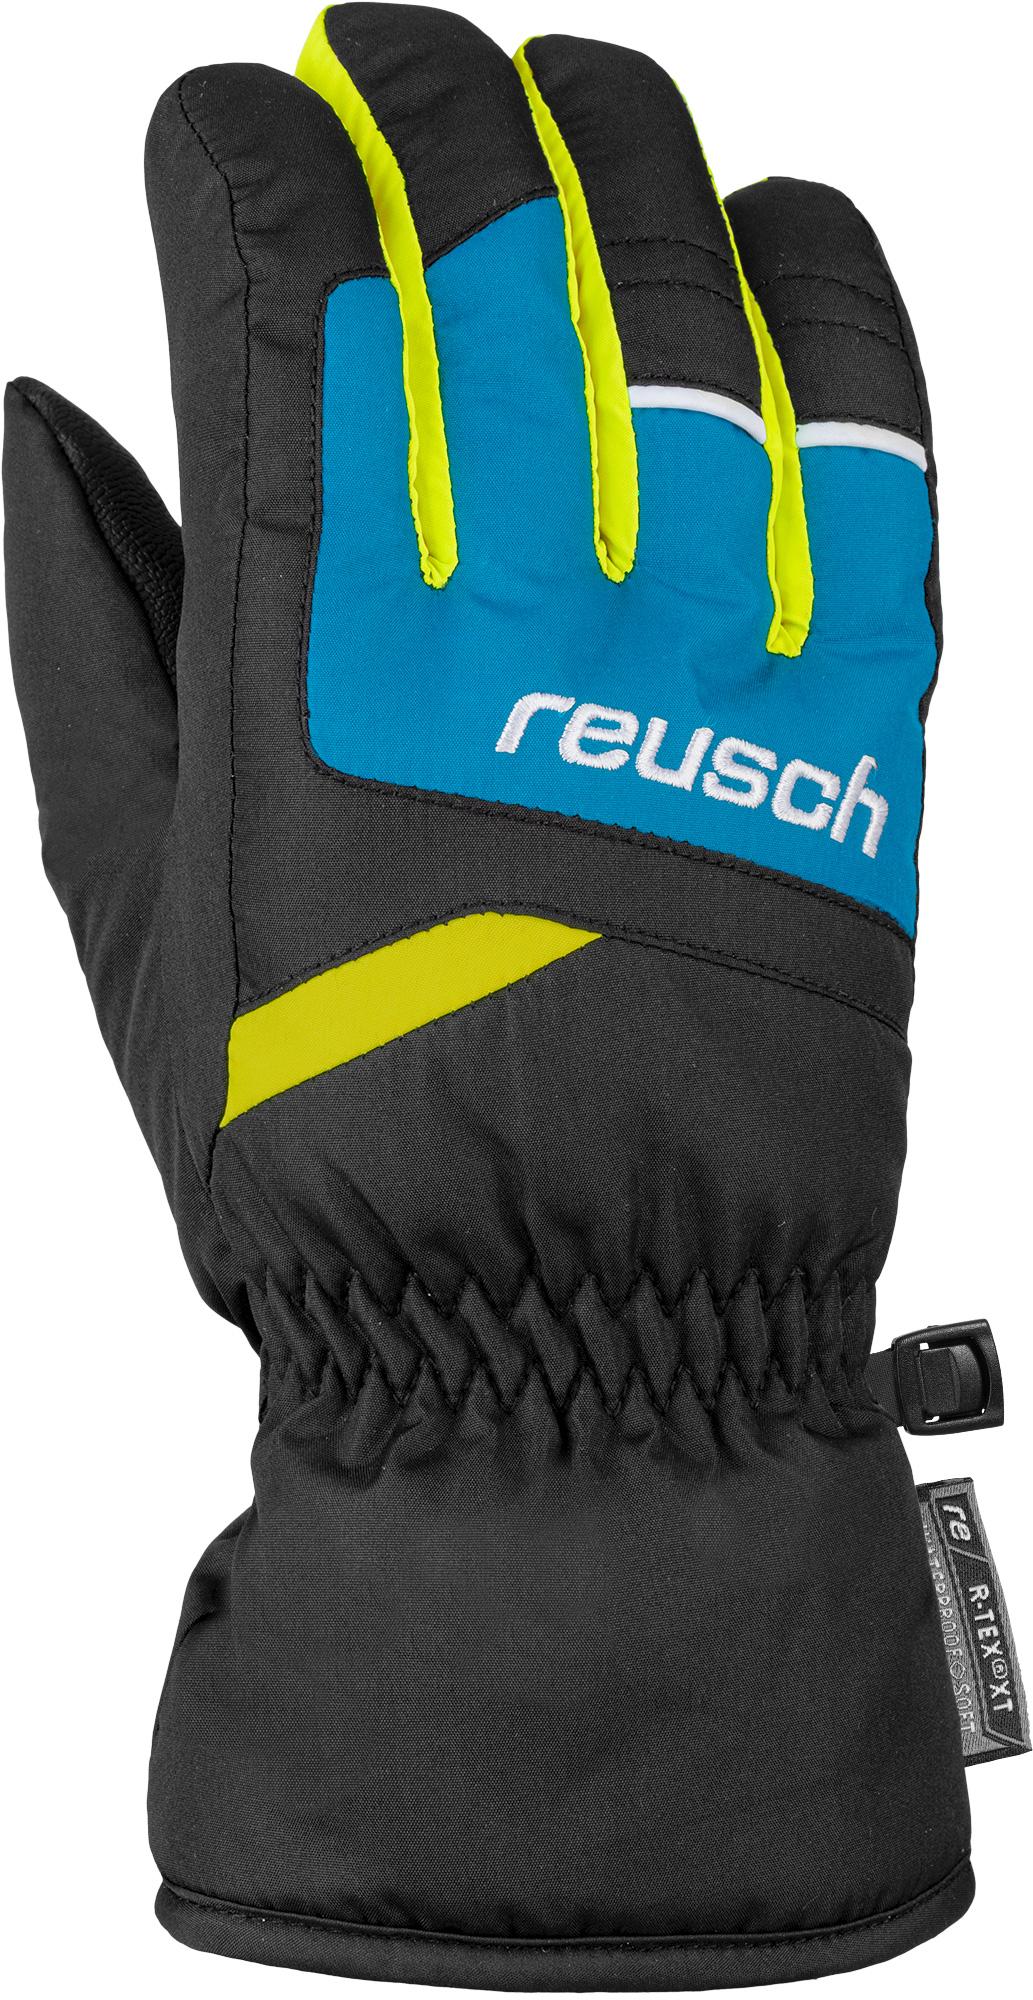 Перчатки Горнолыжные Reusch Bennet R-Tex Xt Black/Brilliant Blue/Safety Yellow Inch 5